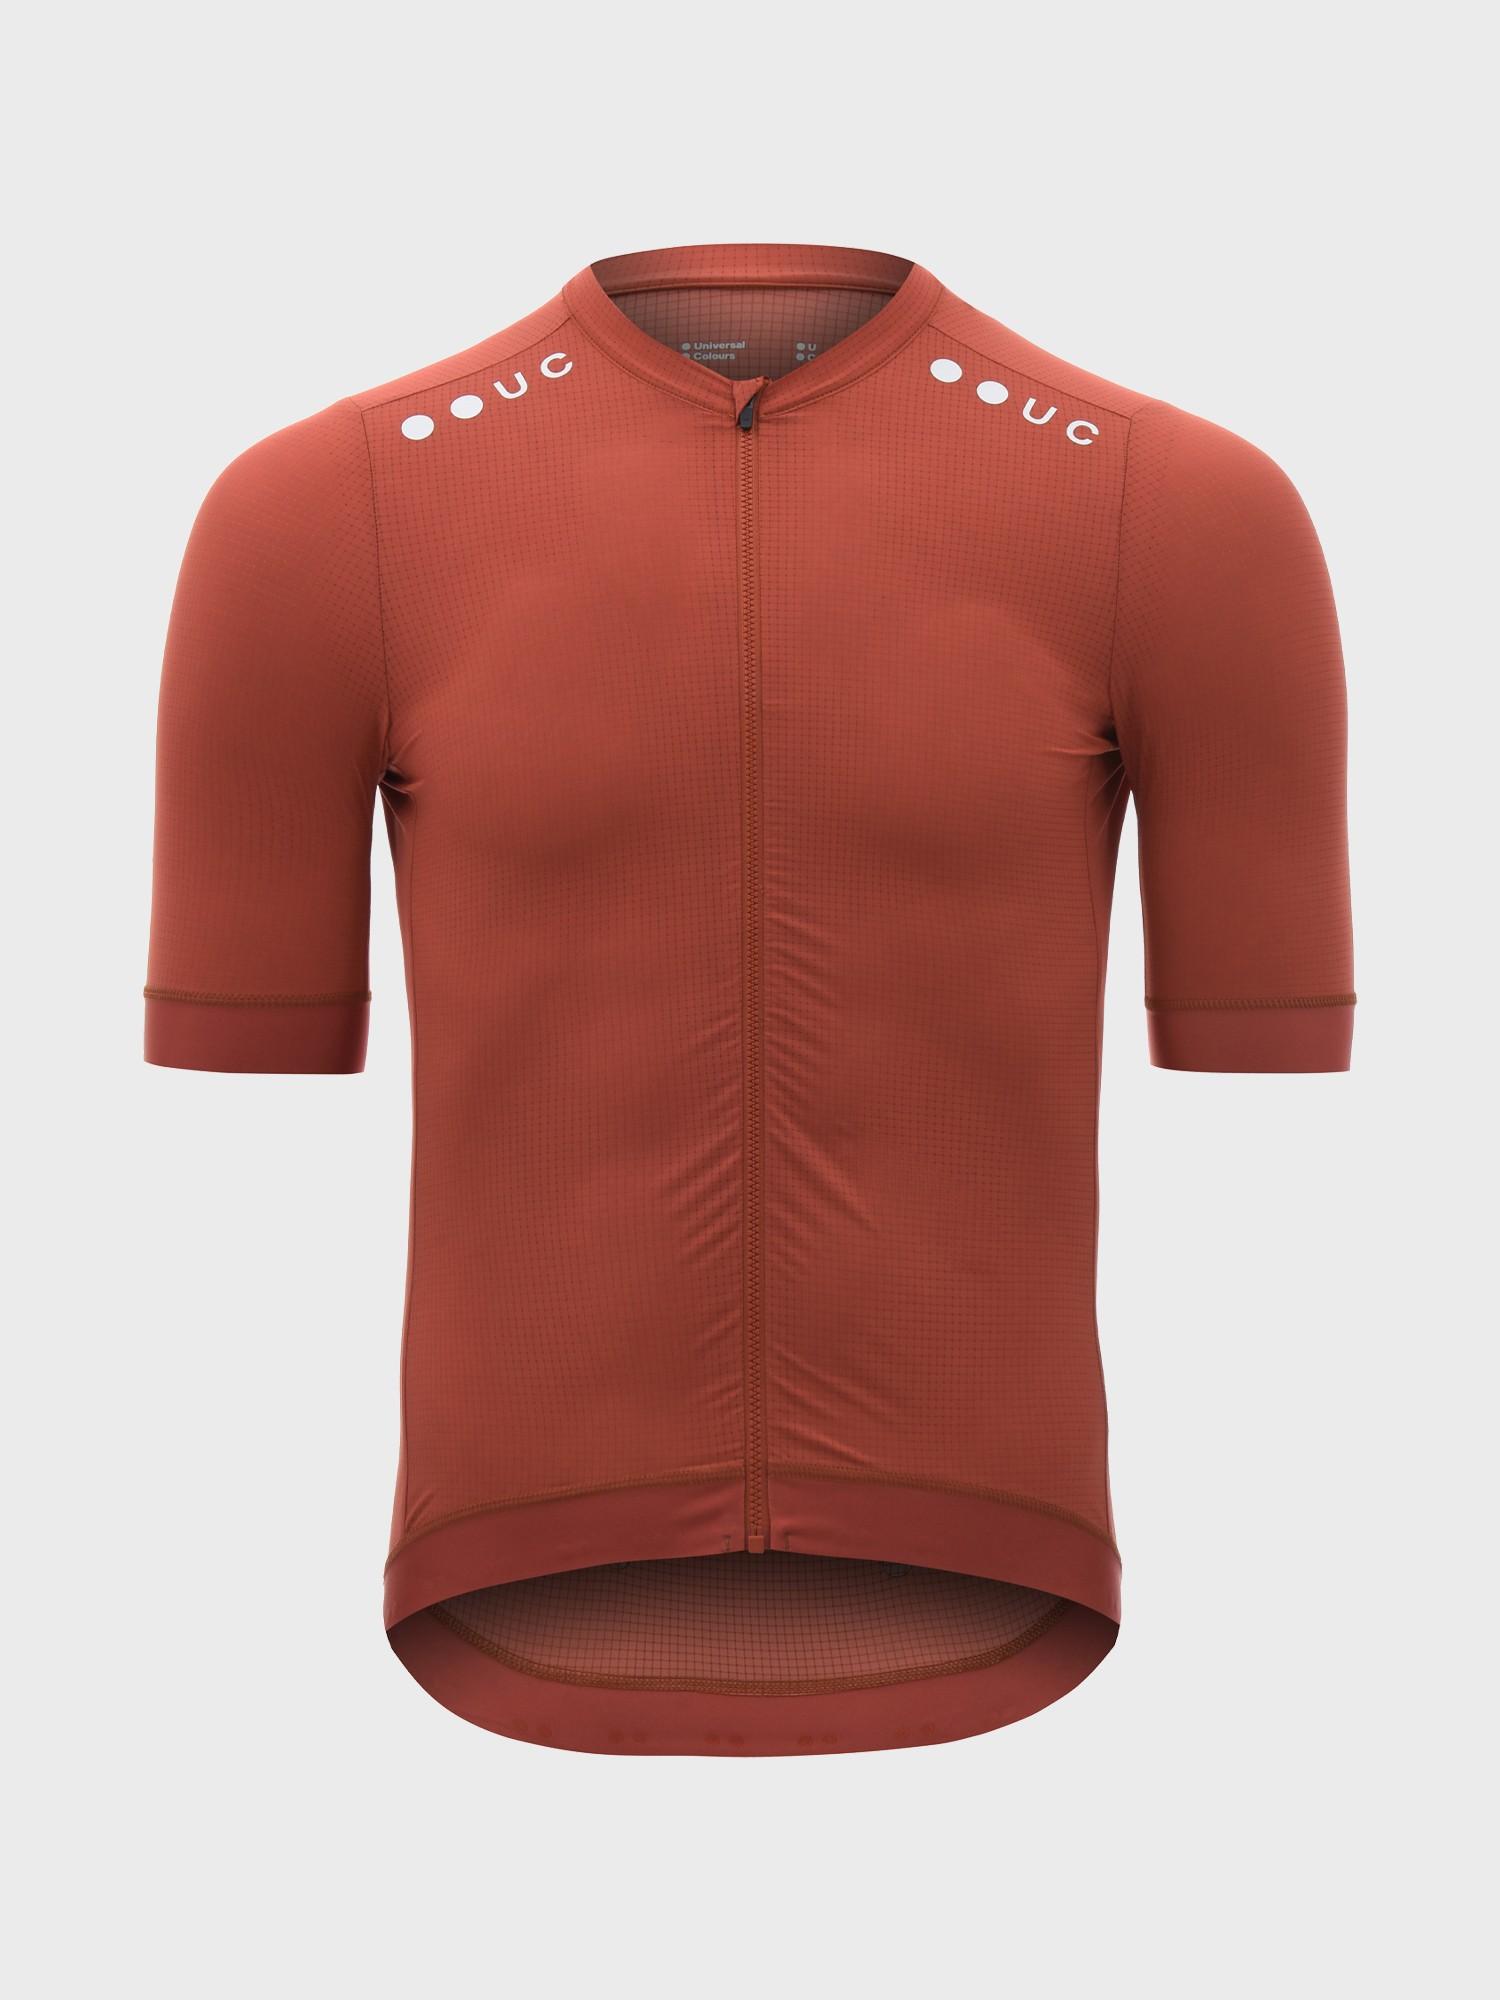 Chroma Short Sleeve Men's Jersey